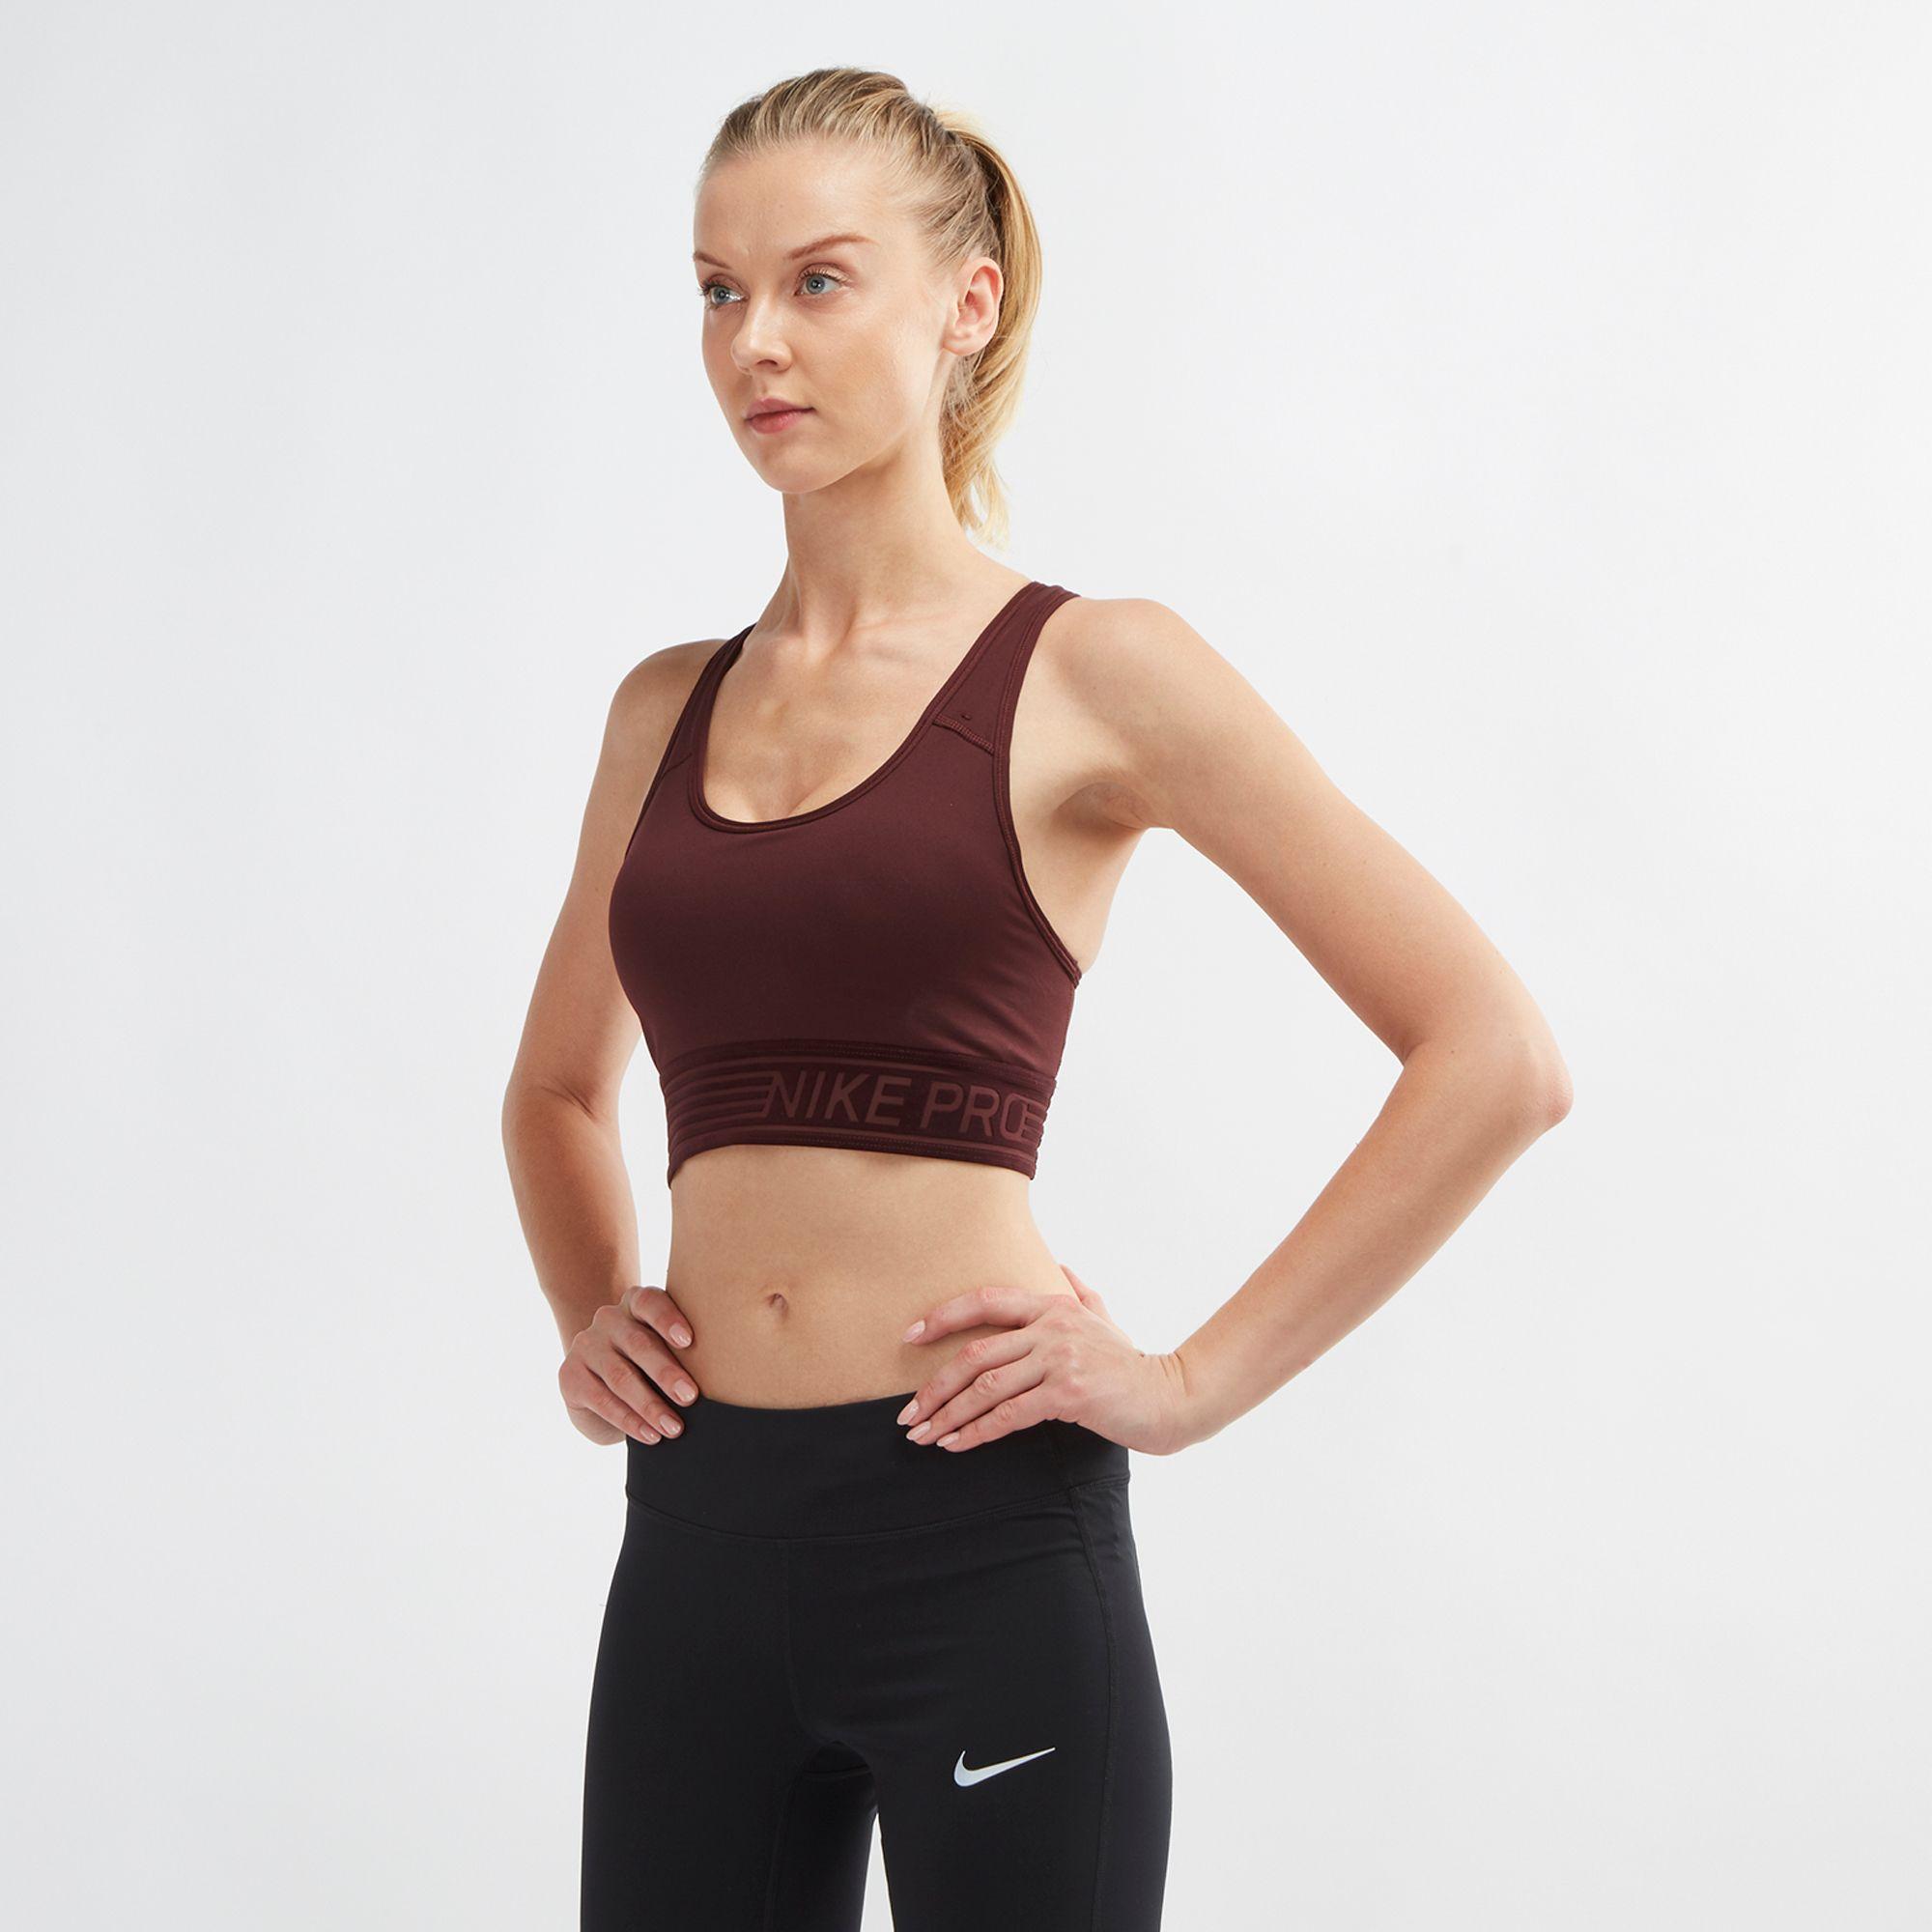 Nike Deluxe Sports Bra | Medium Support